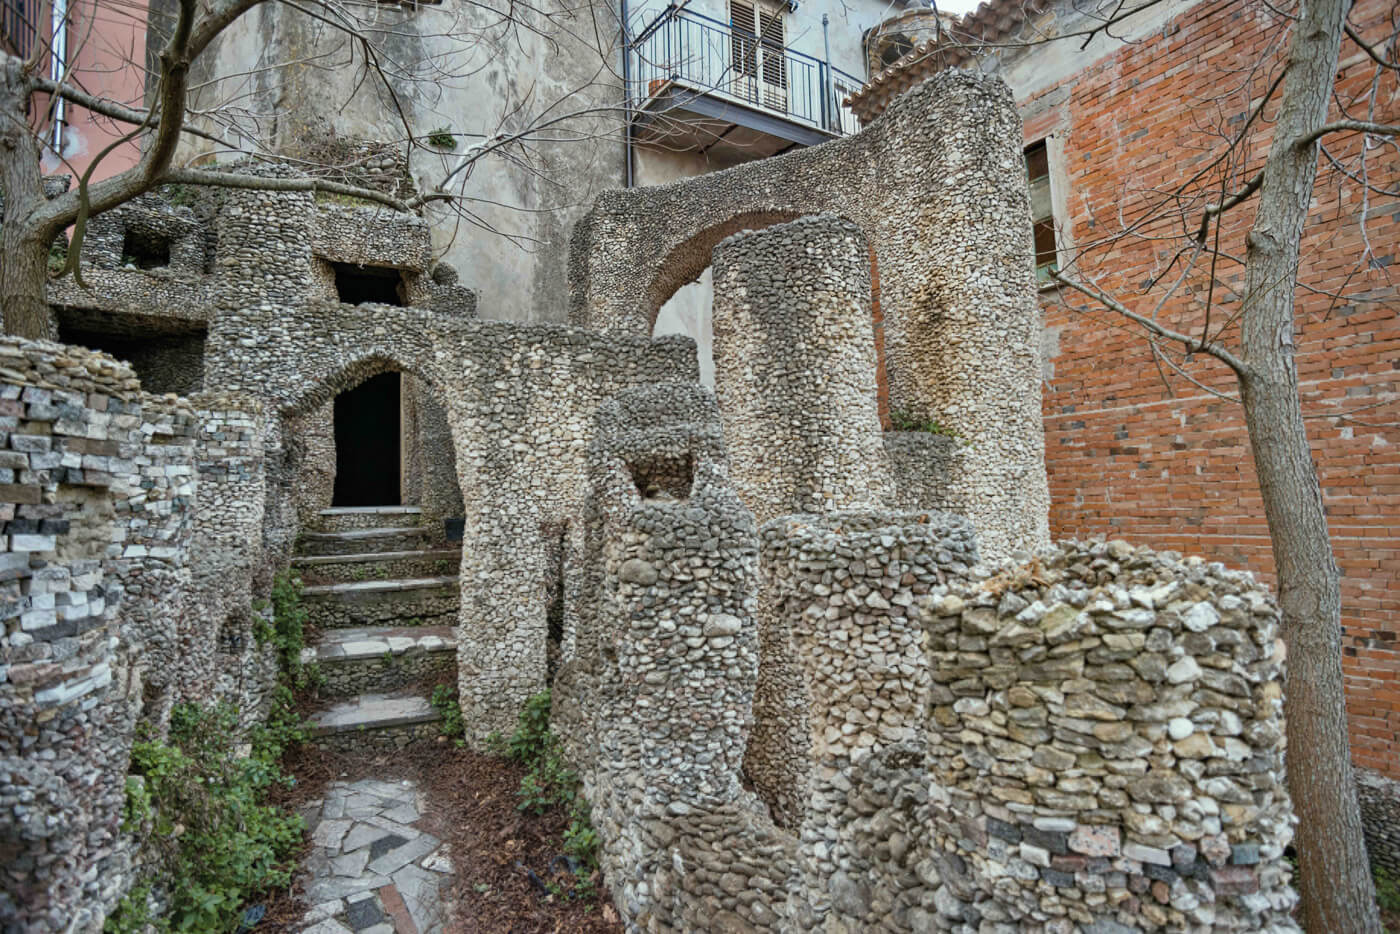 Giardino di Pietra di Guerino Galzerano